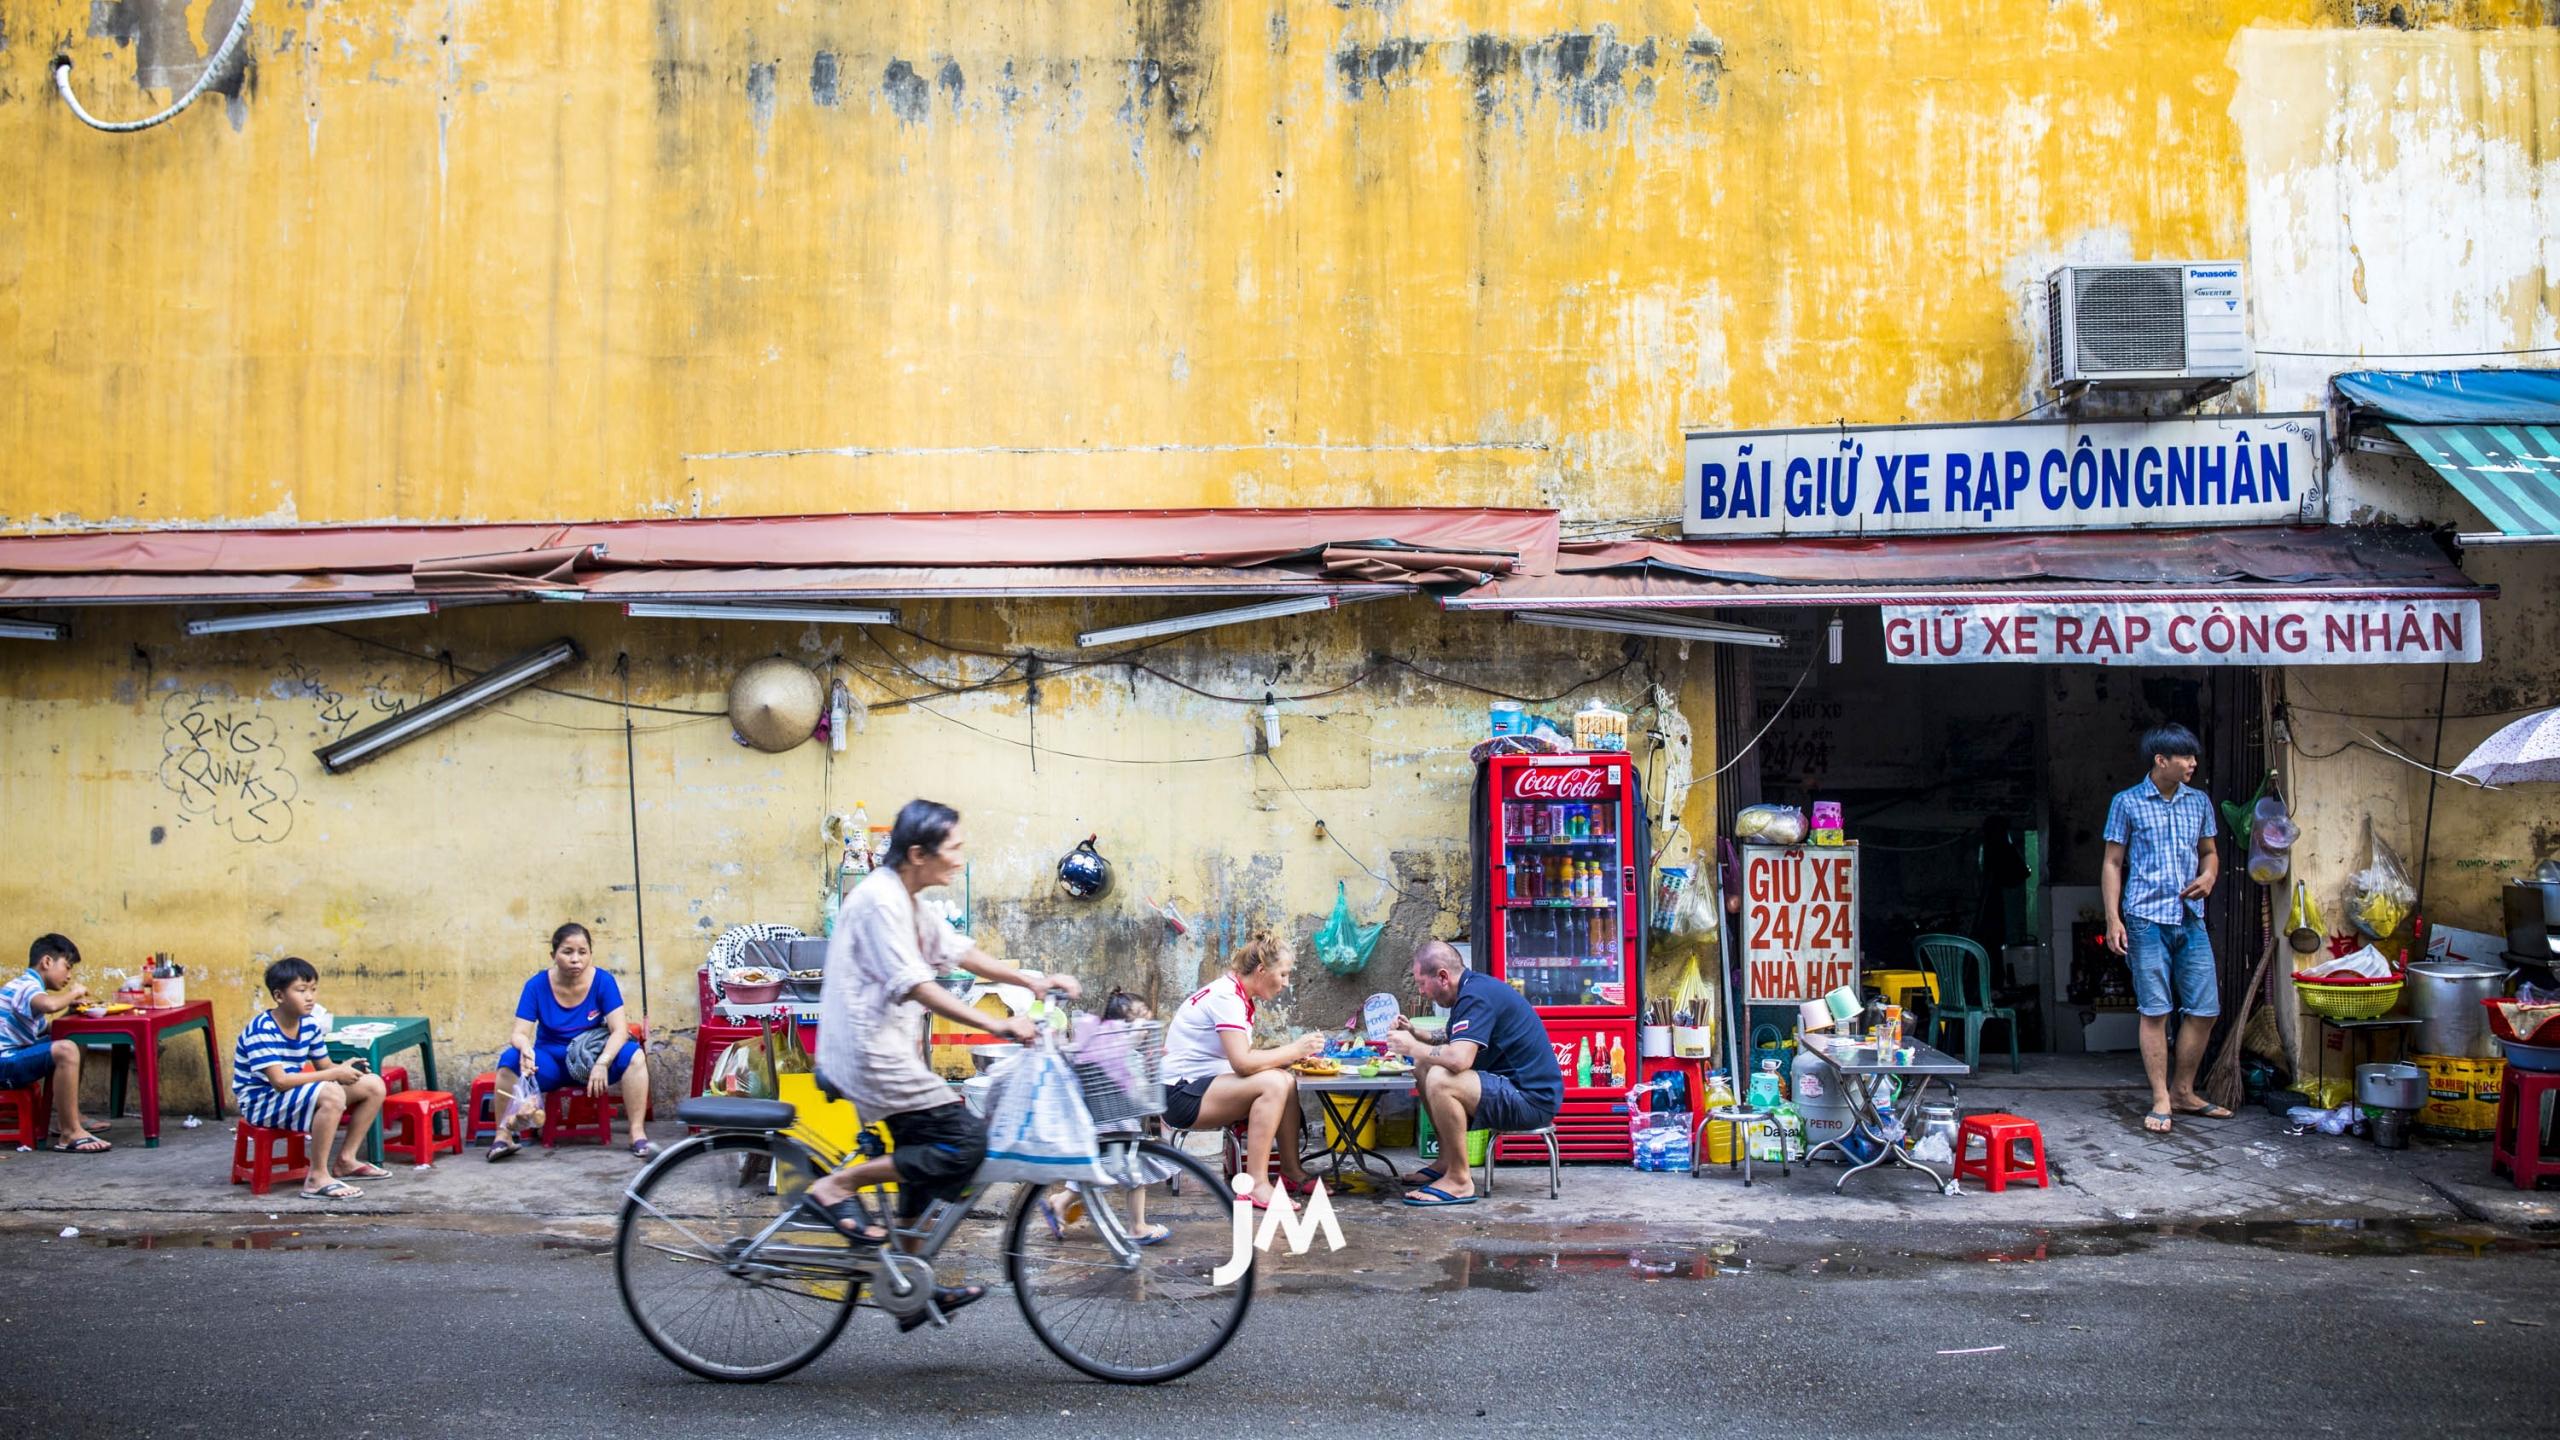 Vietnam, Hanoi Old Quarter Street Photography